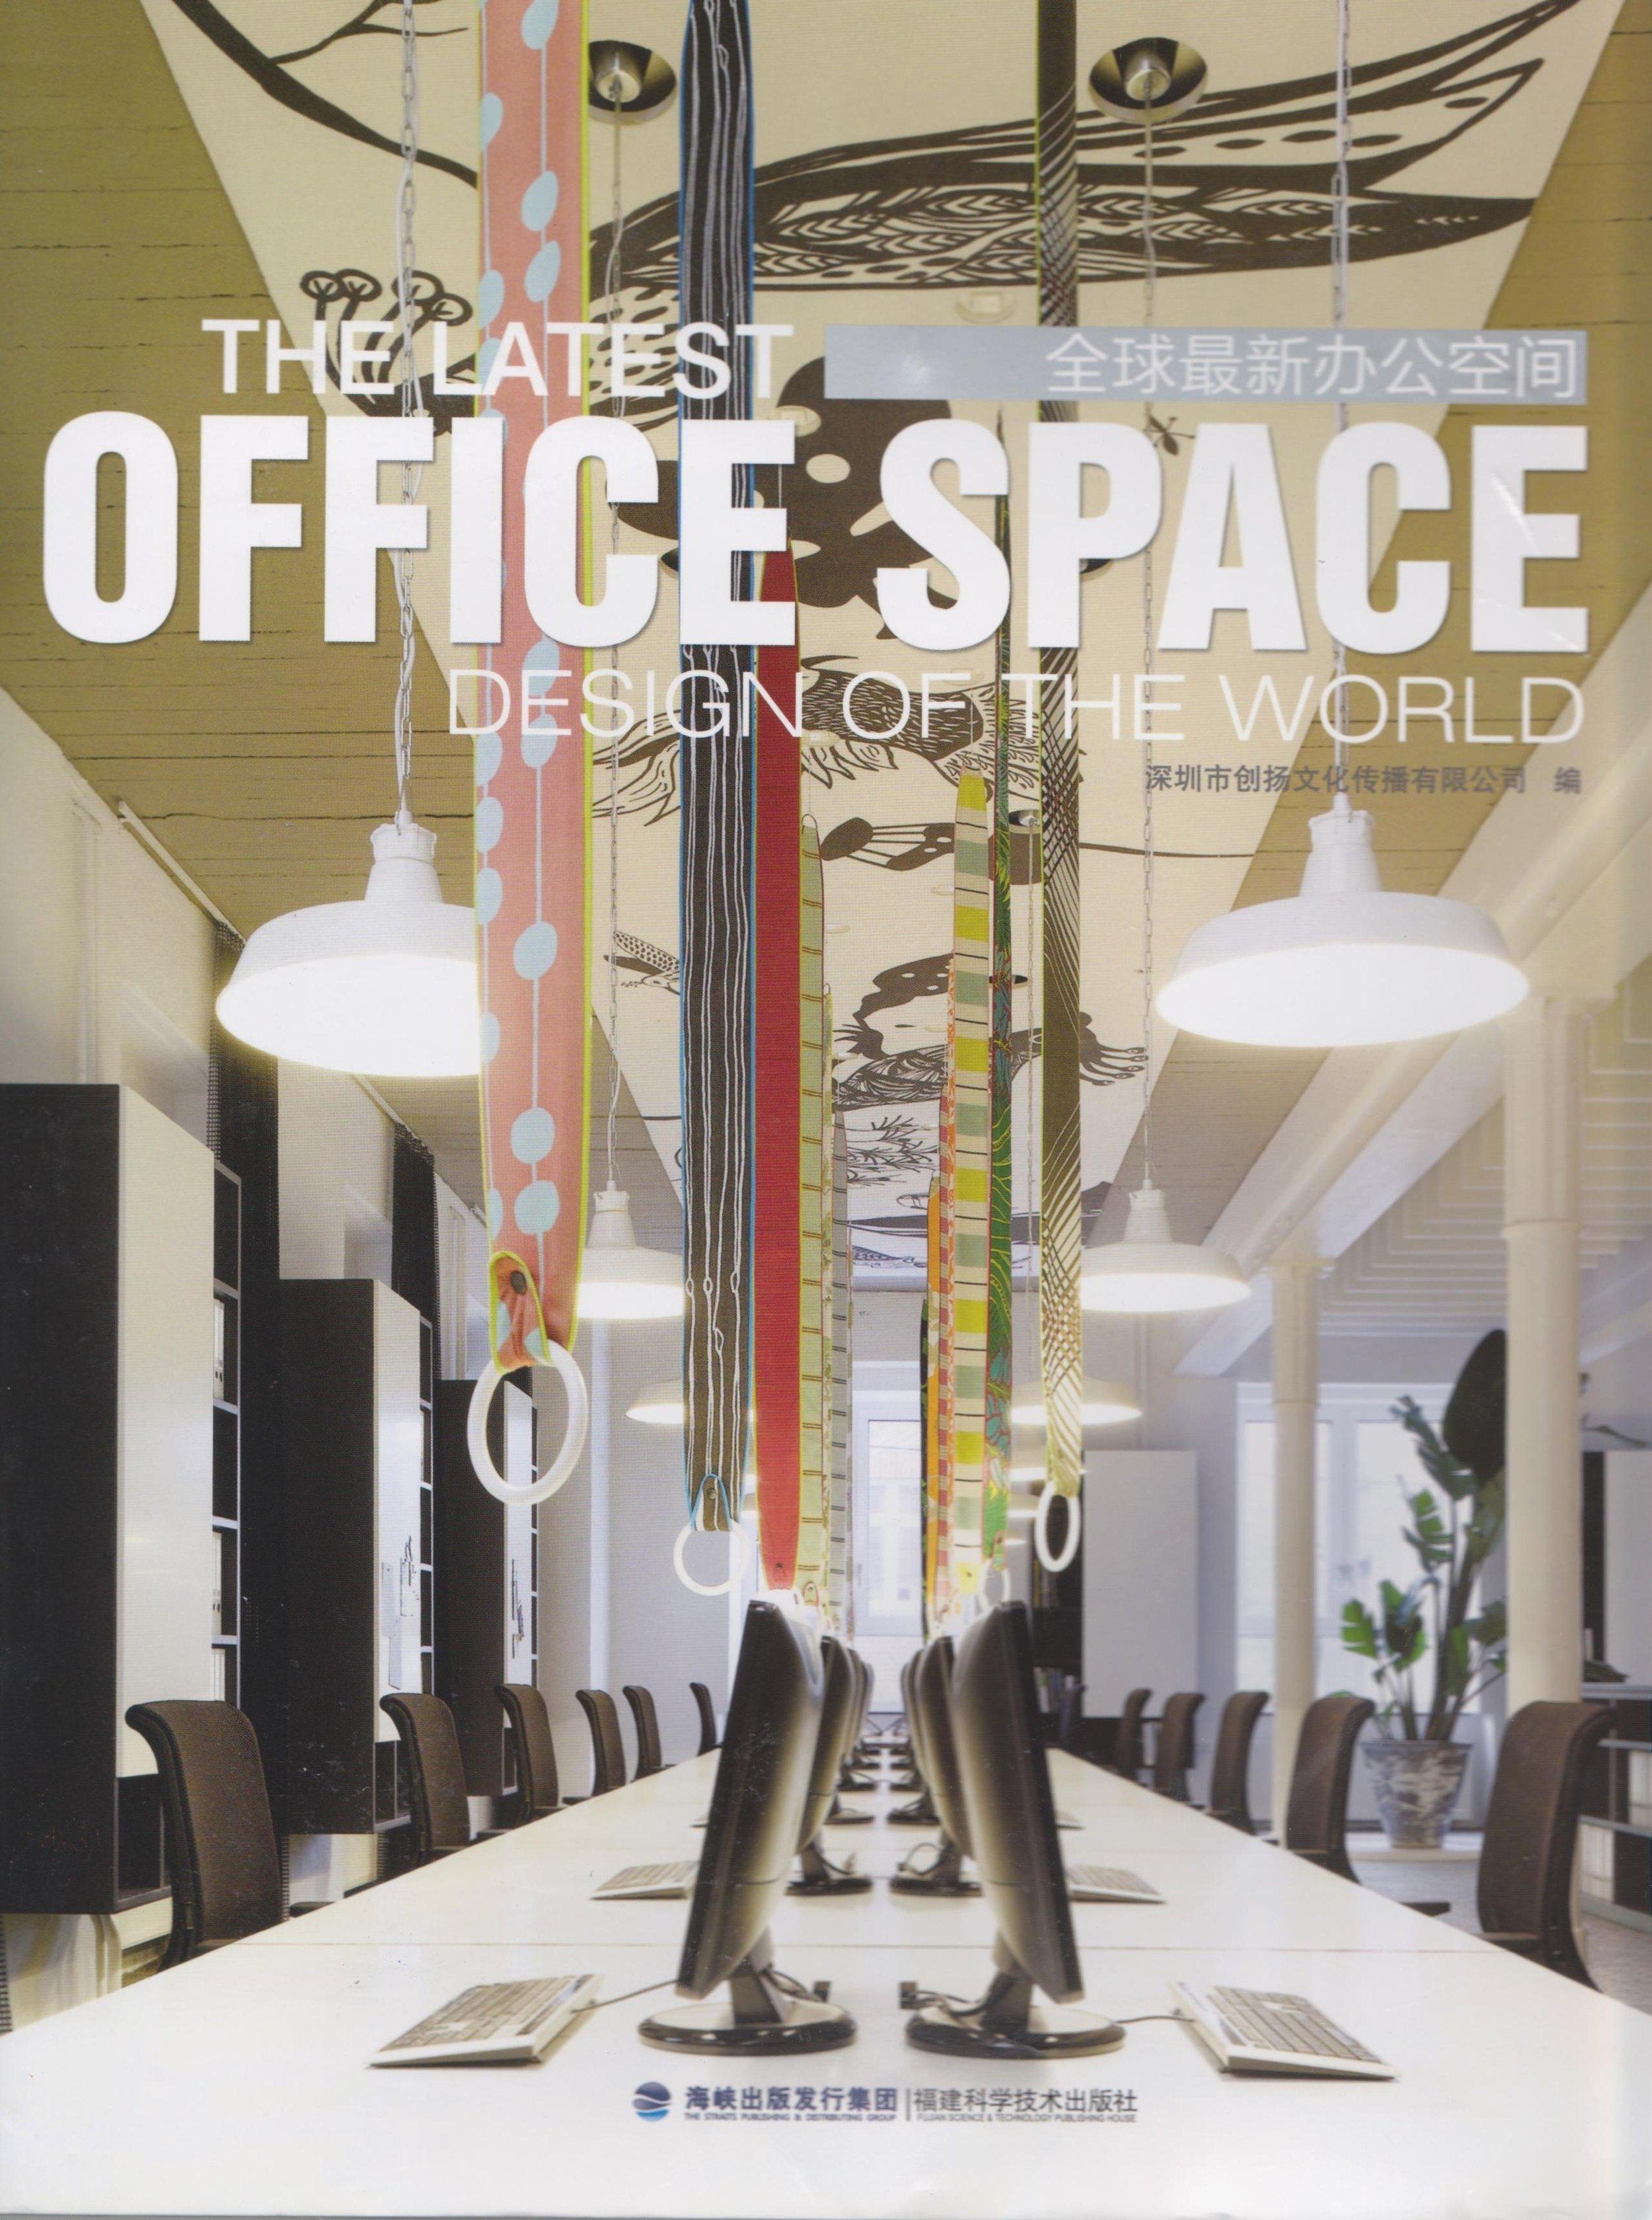 Collectin Büros, Chris van Uffelen, Braun Publishing, 2010, ISBN 978-7-5335-3740-1